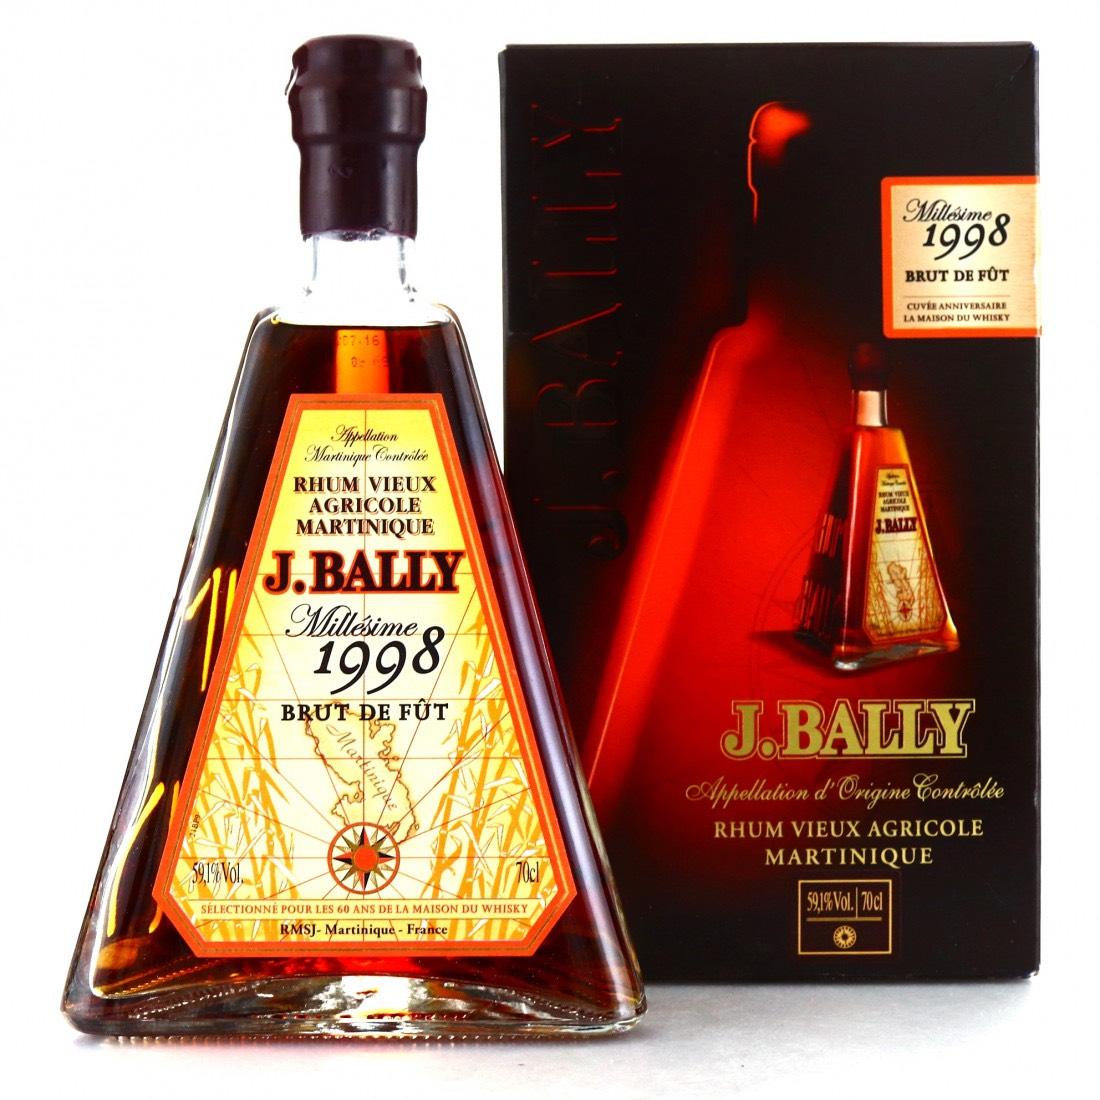 Bottle image of J. Bally Millésime 1998